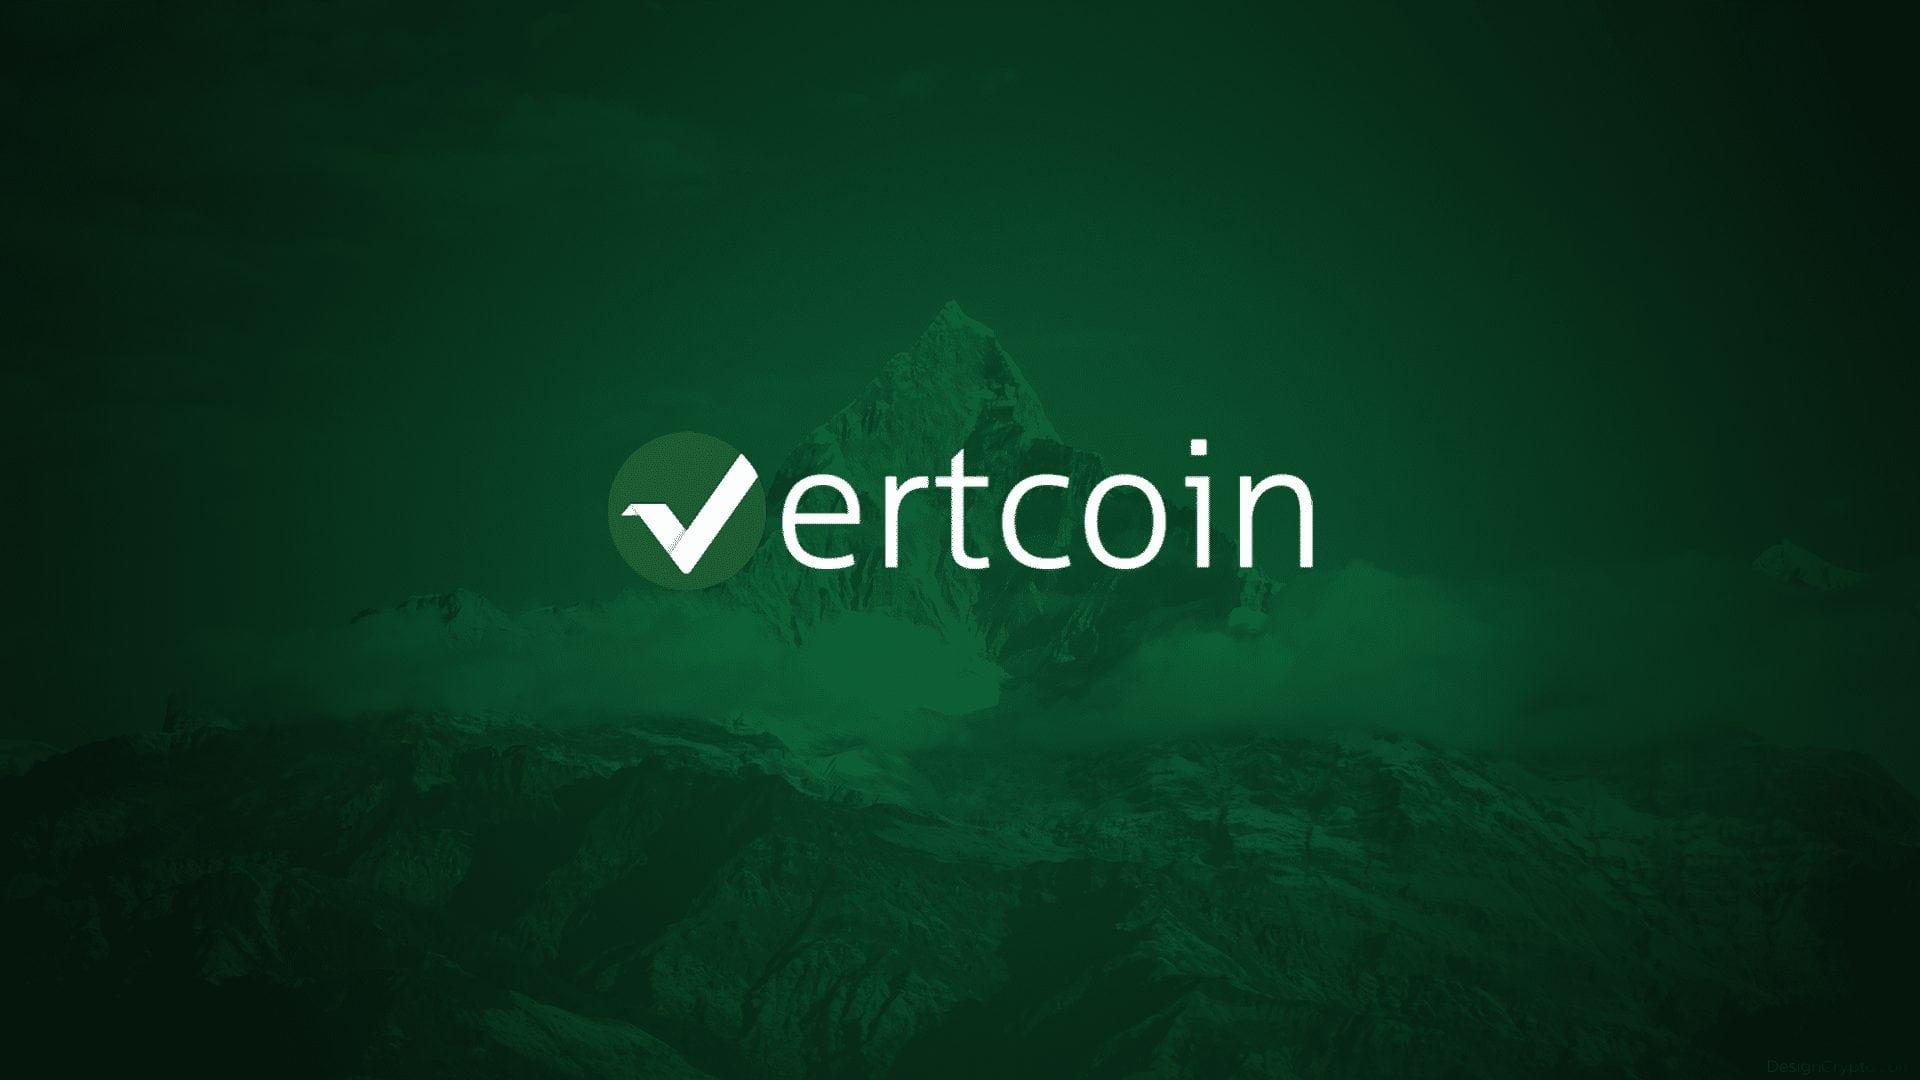 vertcion - Vertcoin (VTC) Should Dethrone Bitcoin (BTC)